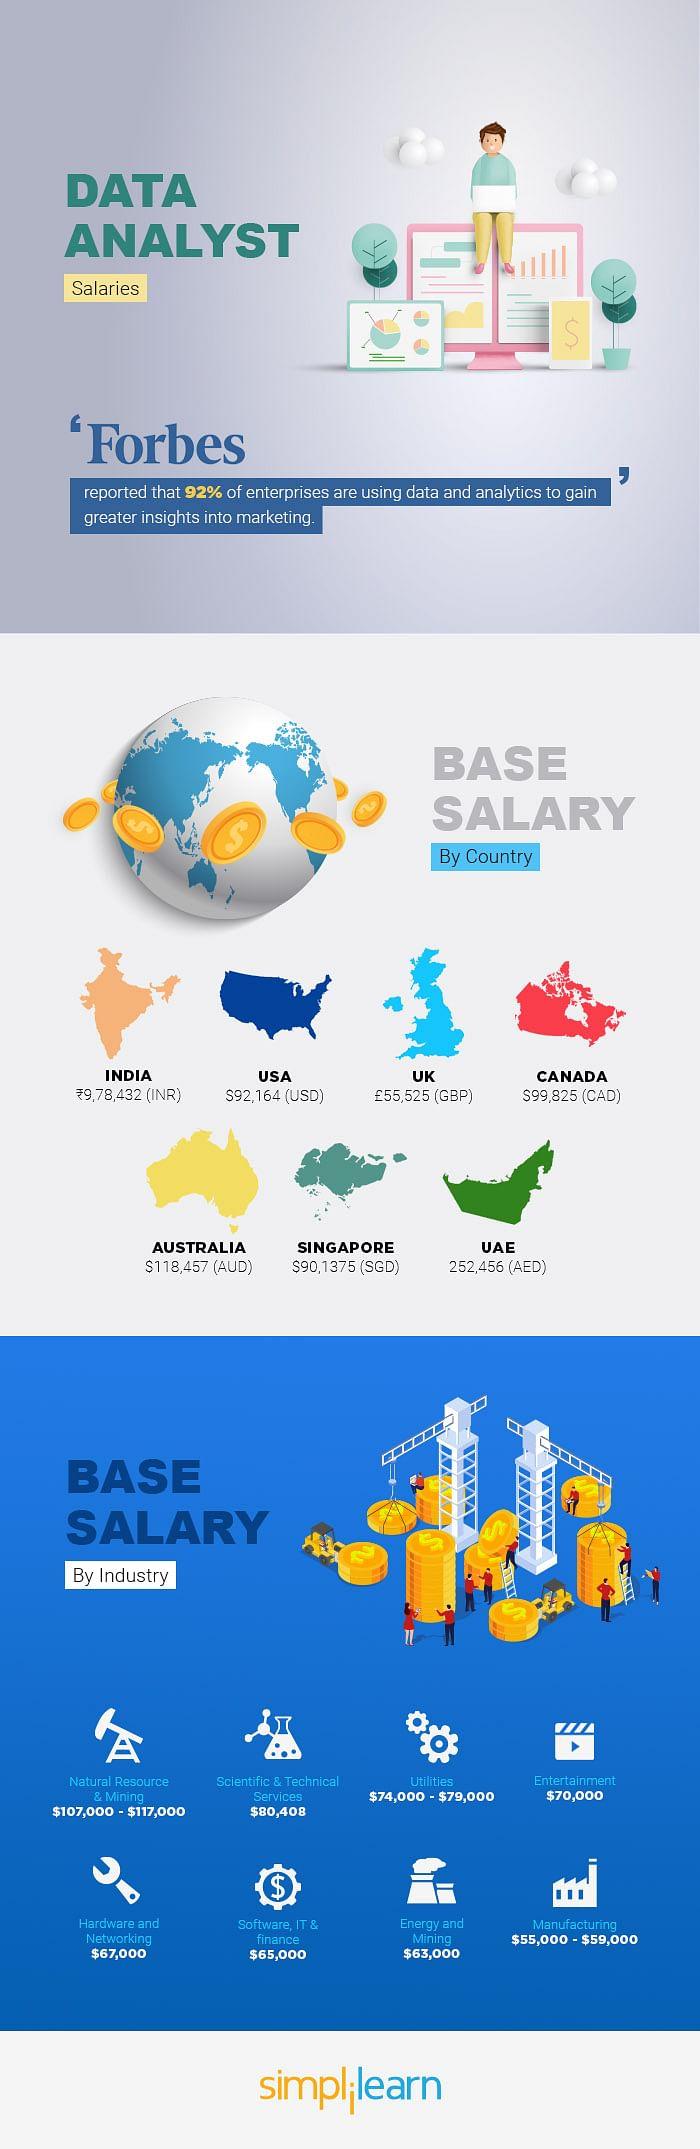 Data Analyst Salaries 9 Highest Paying Industries Around The World